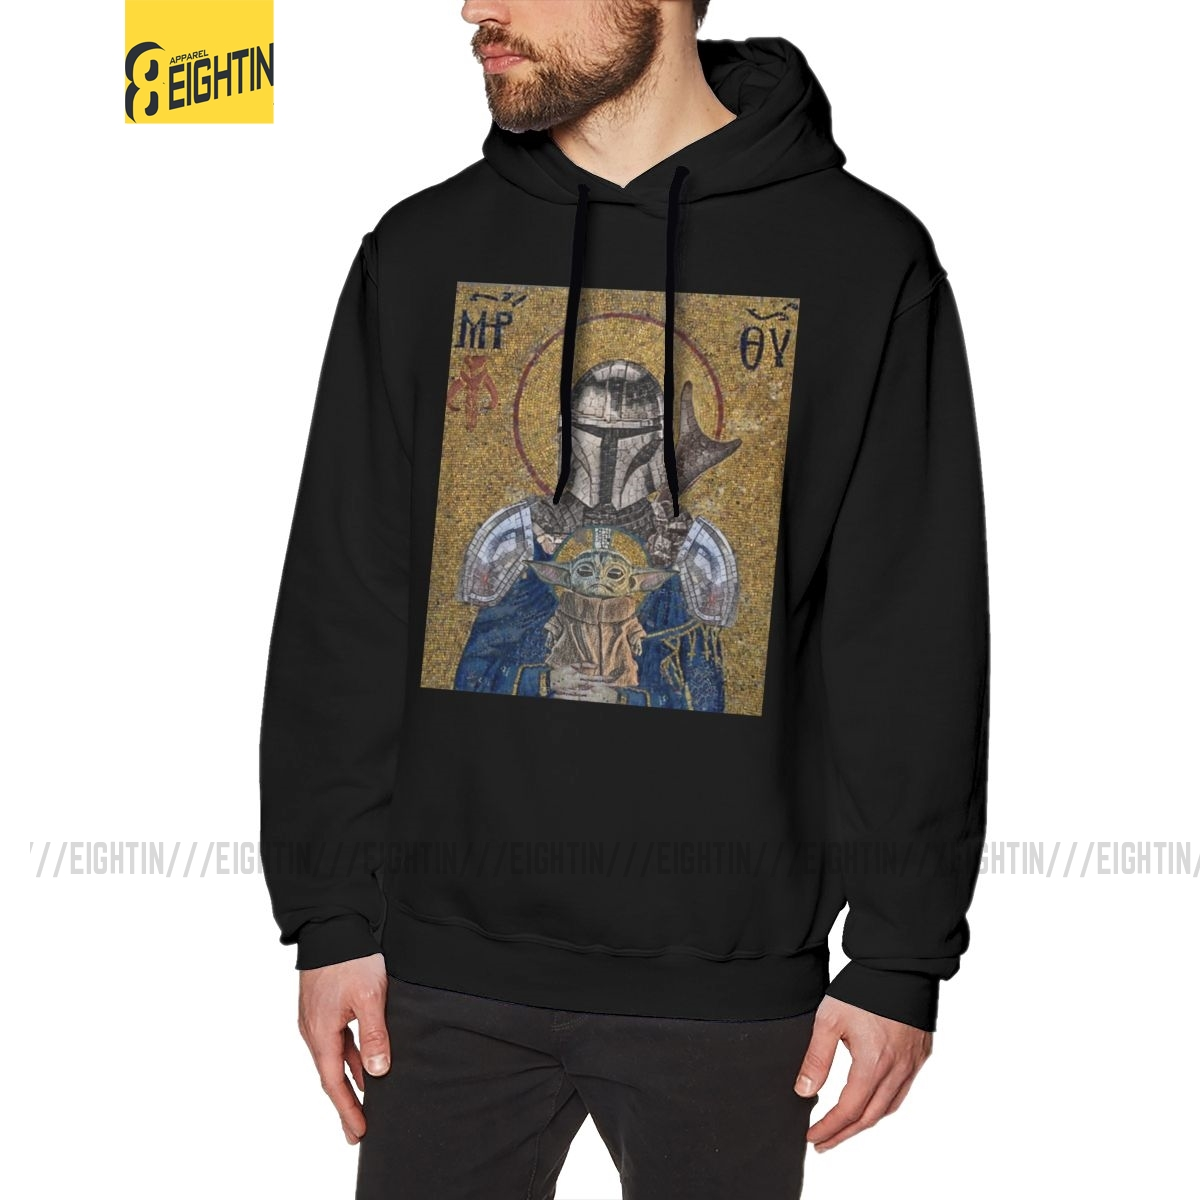 The Child Is My Religion Hoodies Man Funky Yoda Baby Star Wars Jedi Fett Hoodie The Mandalorian Cotton Hooded Sweatshirts